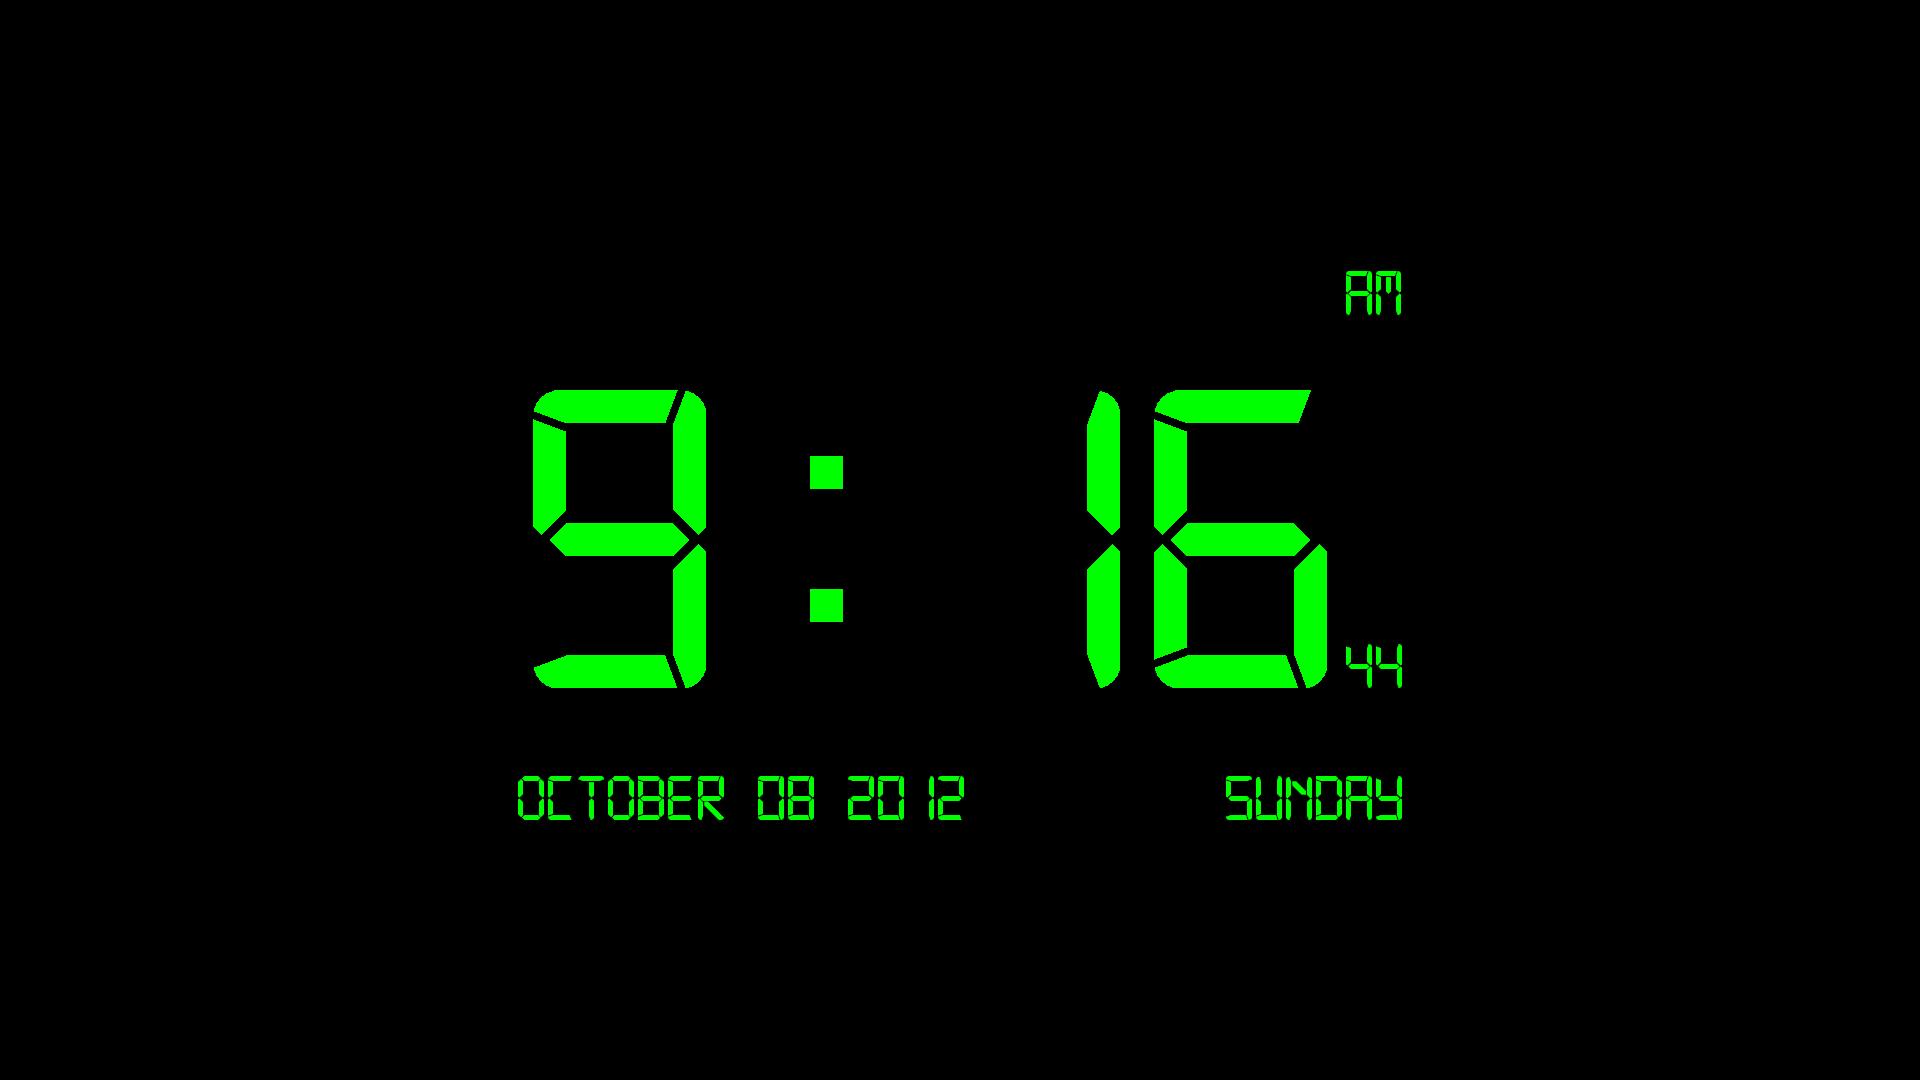 Digital Clock 7   Digital Clock 7 is a screen saver that displays the 1920x1080